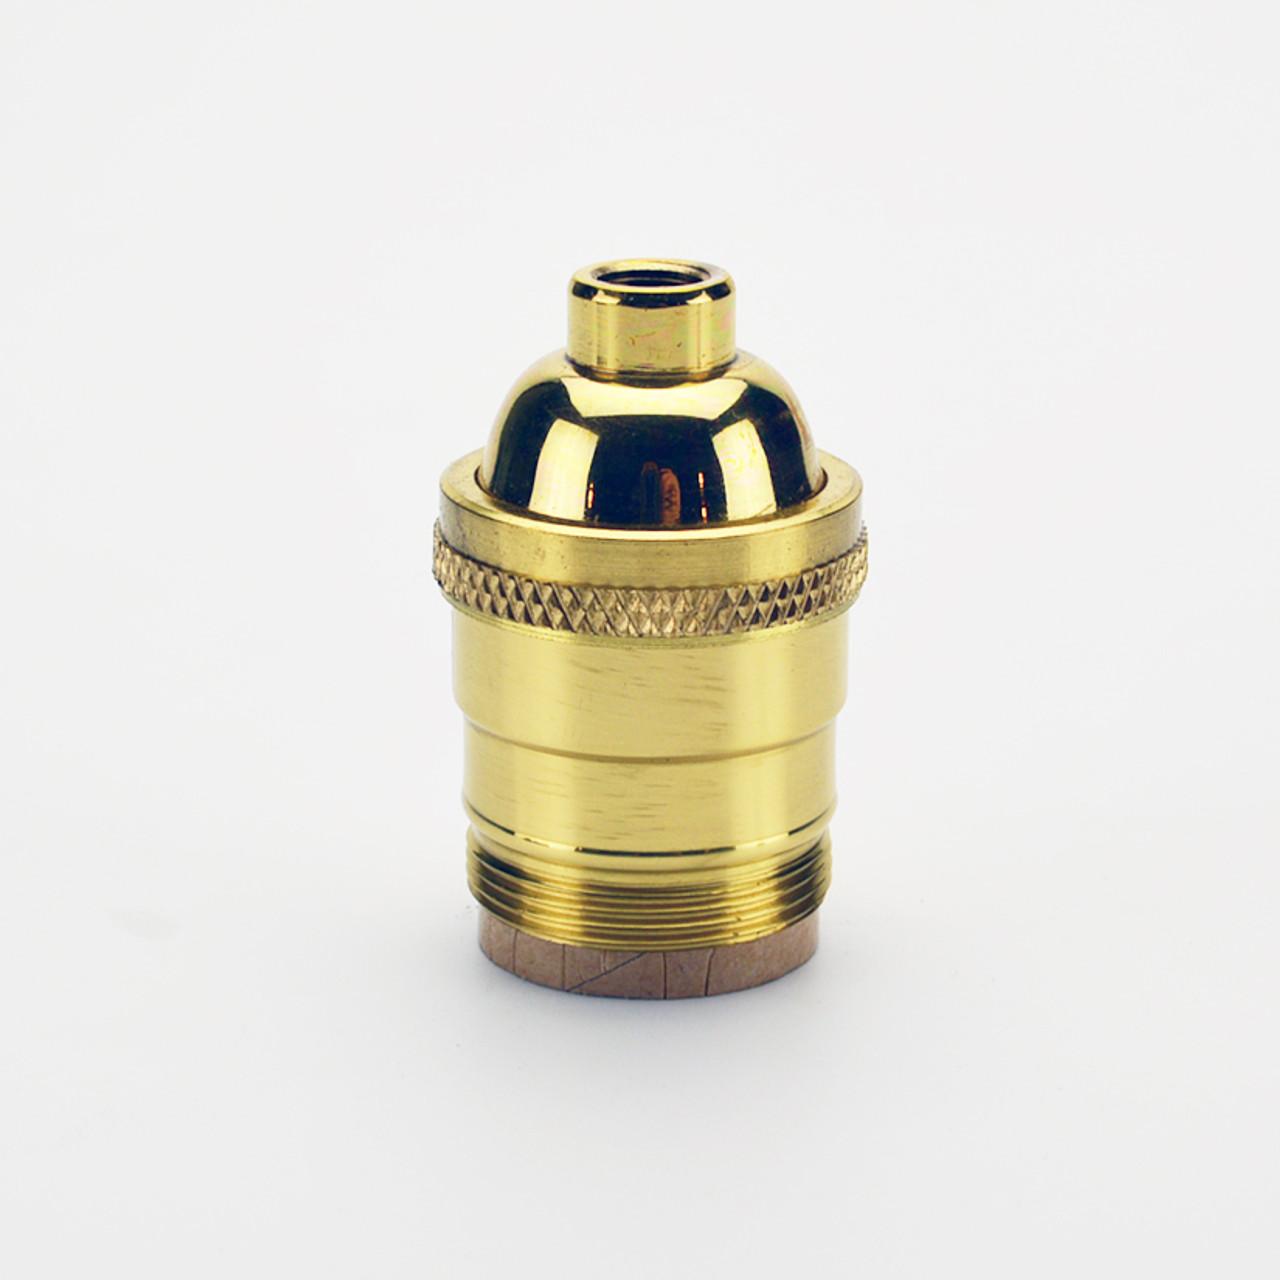 New Solid Brass UNO Ring To Medium E26 Brass Sunlite Socket Nickel Plated #295N